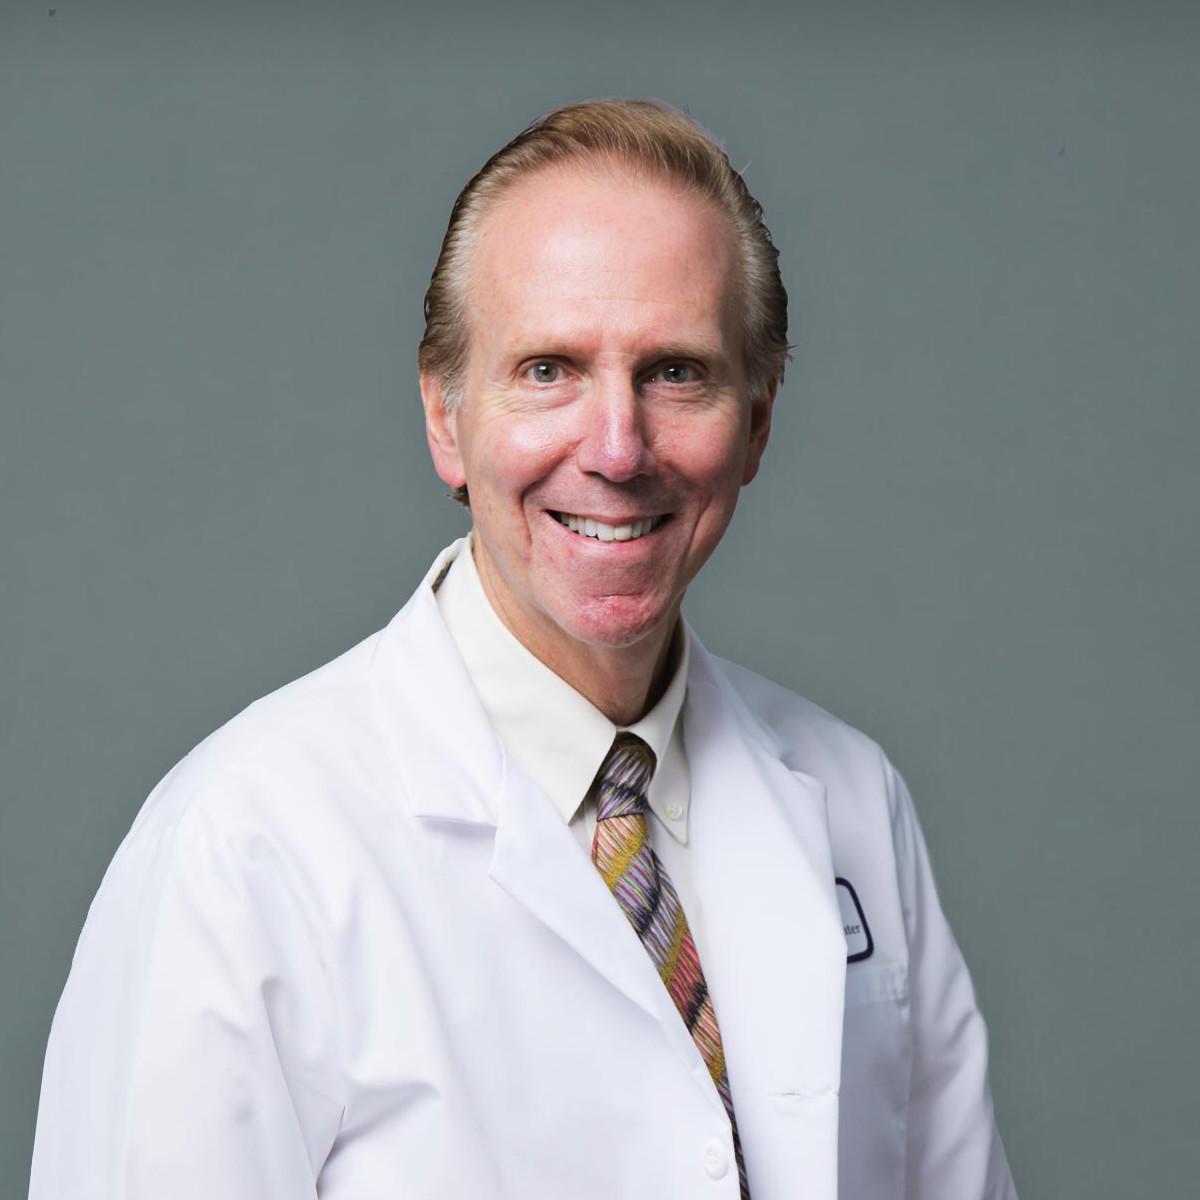 William R. Slater, MD